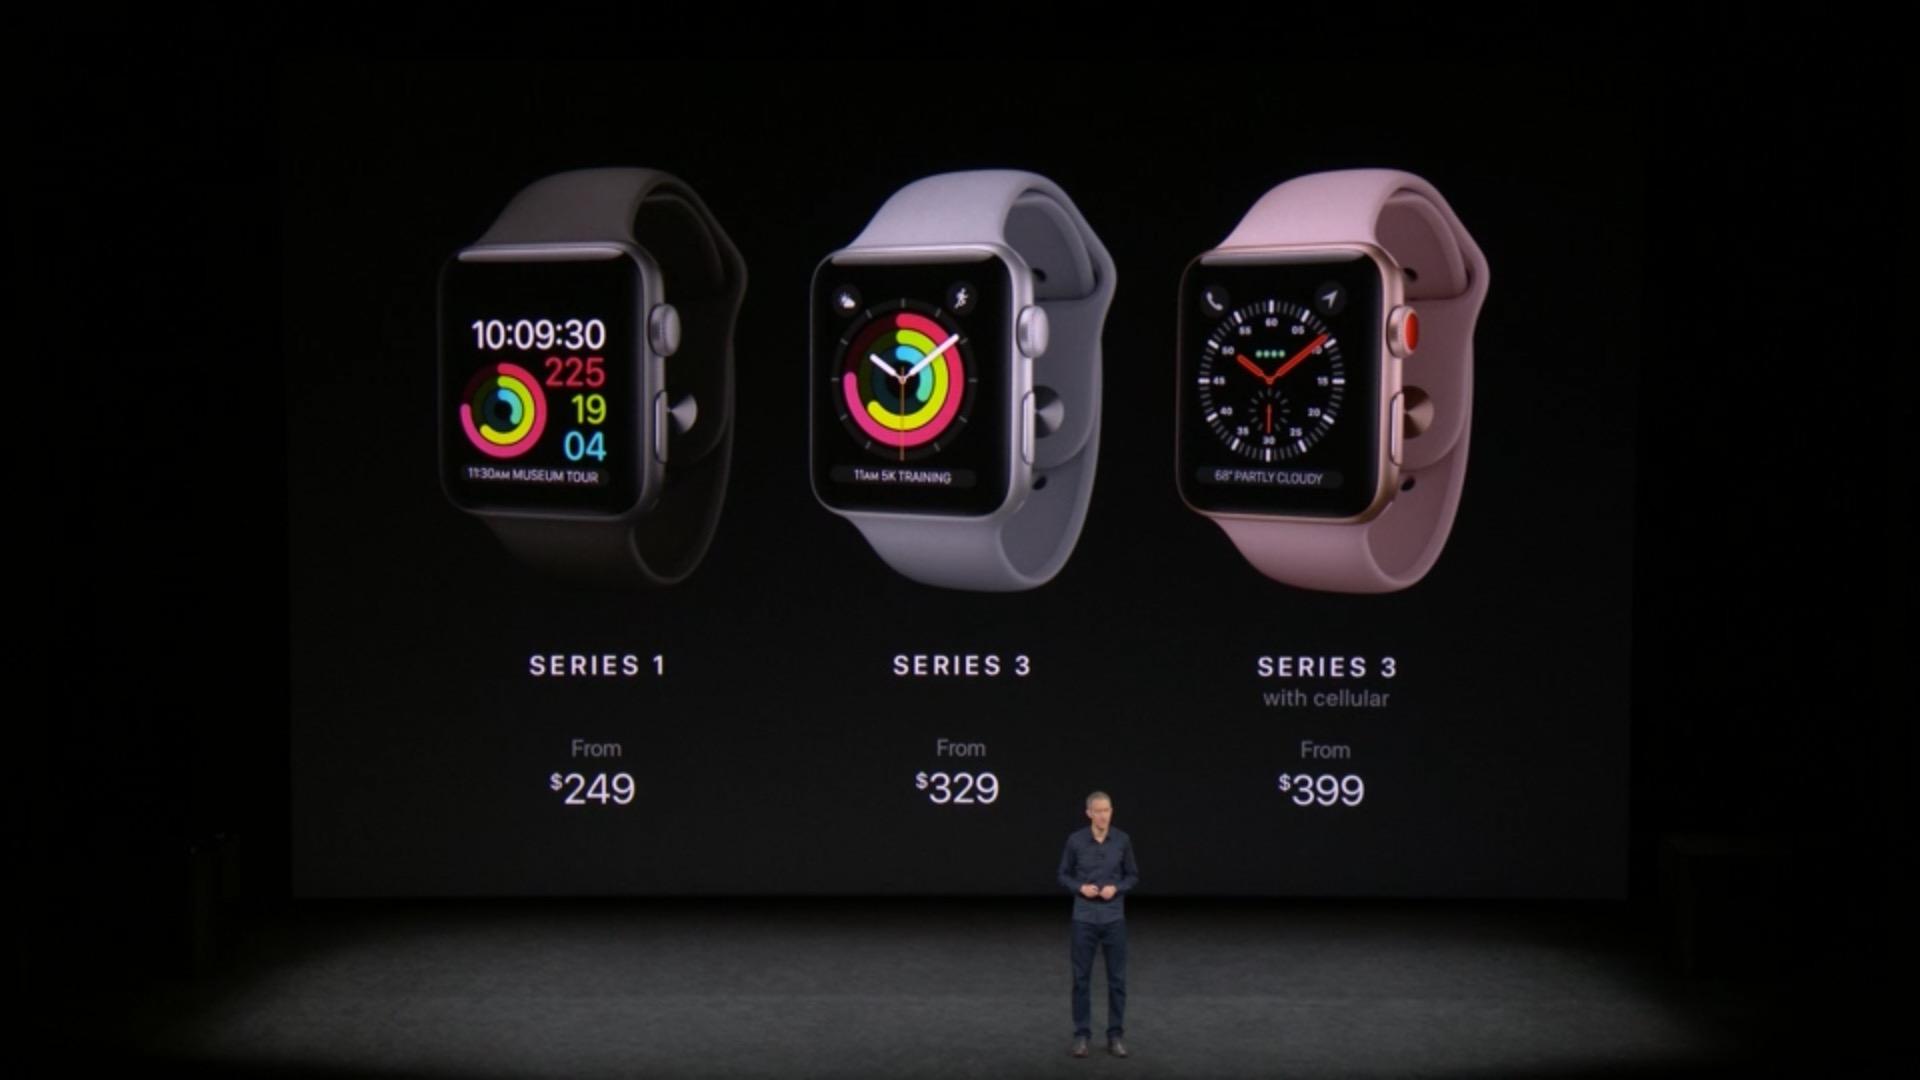 apple watch series 3 black friday deals